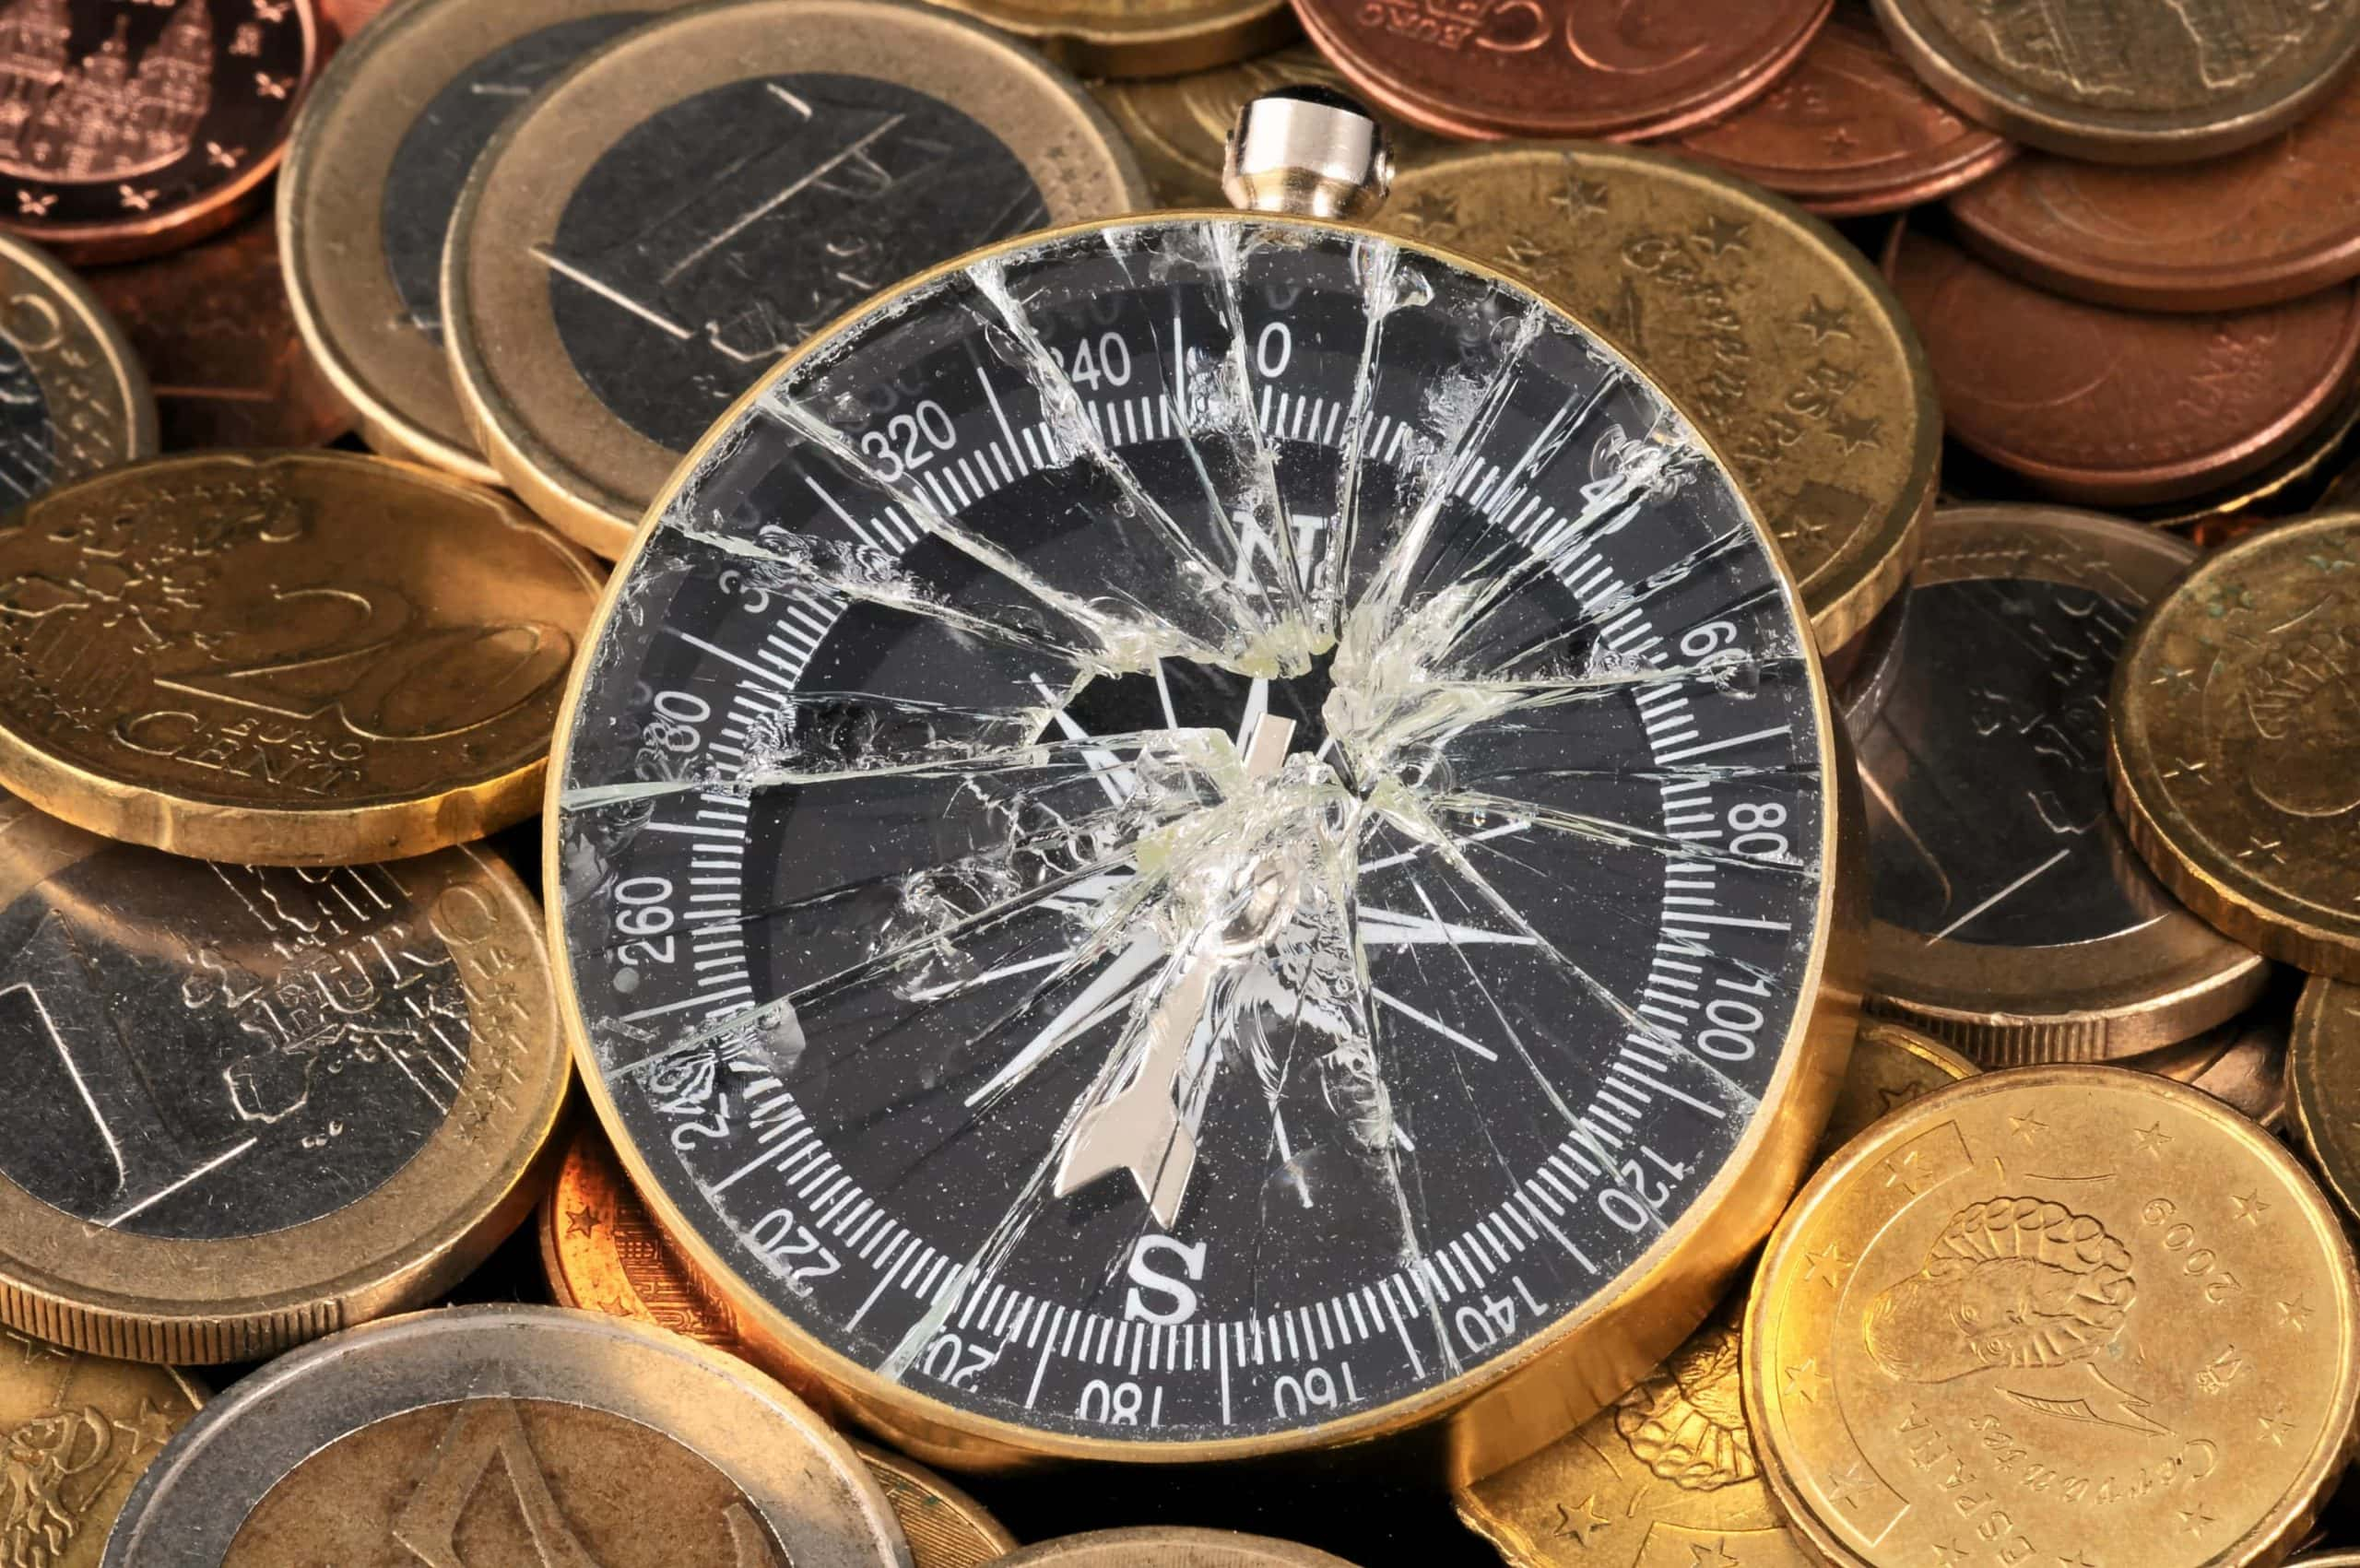 Ein Kapituuter Kompass auf Euro-Münzen